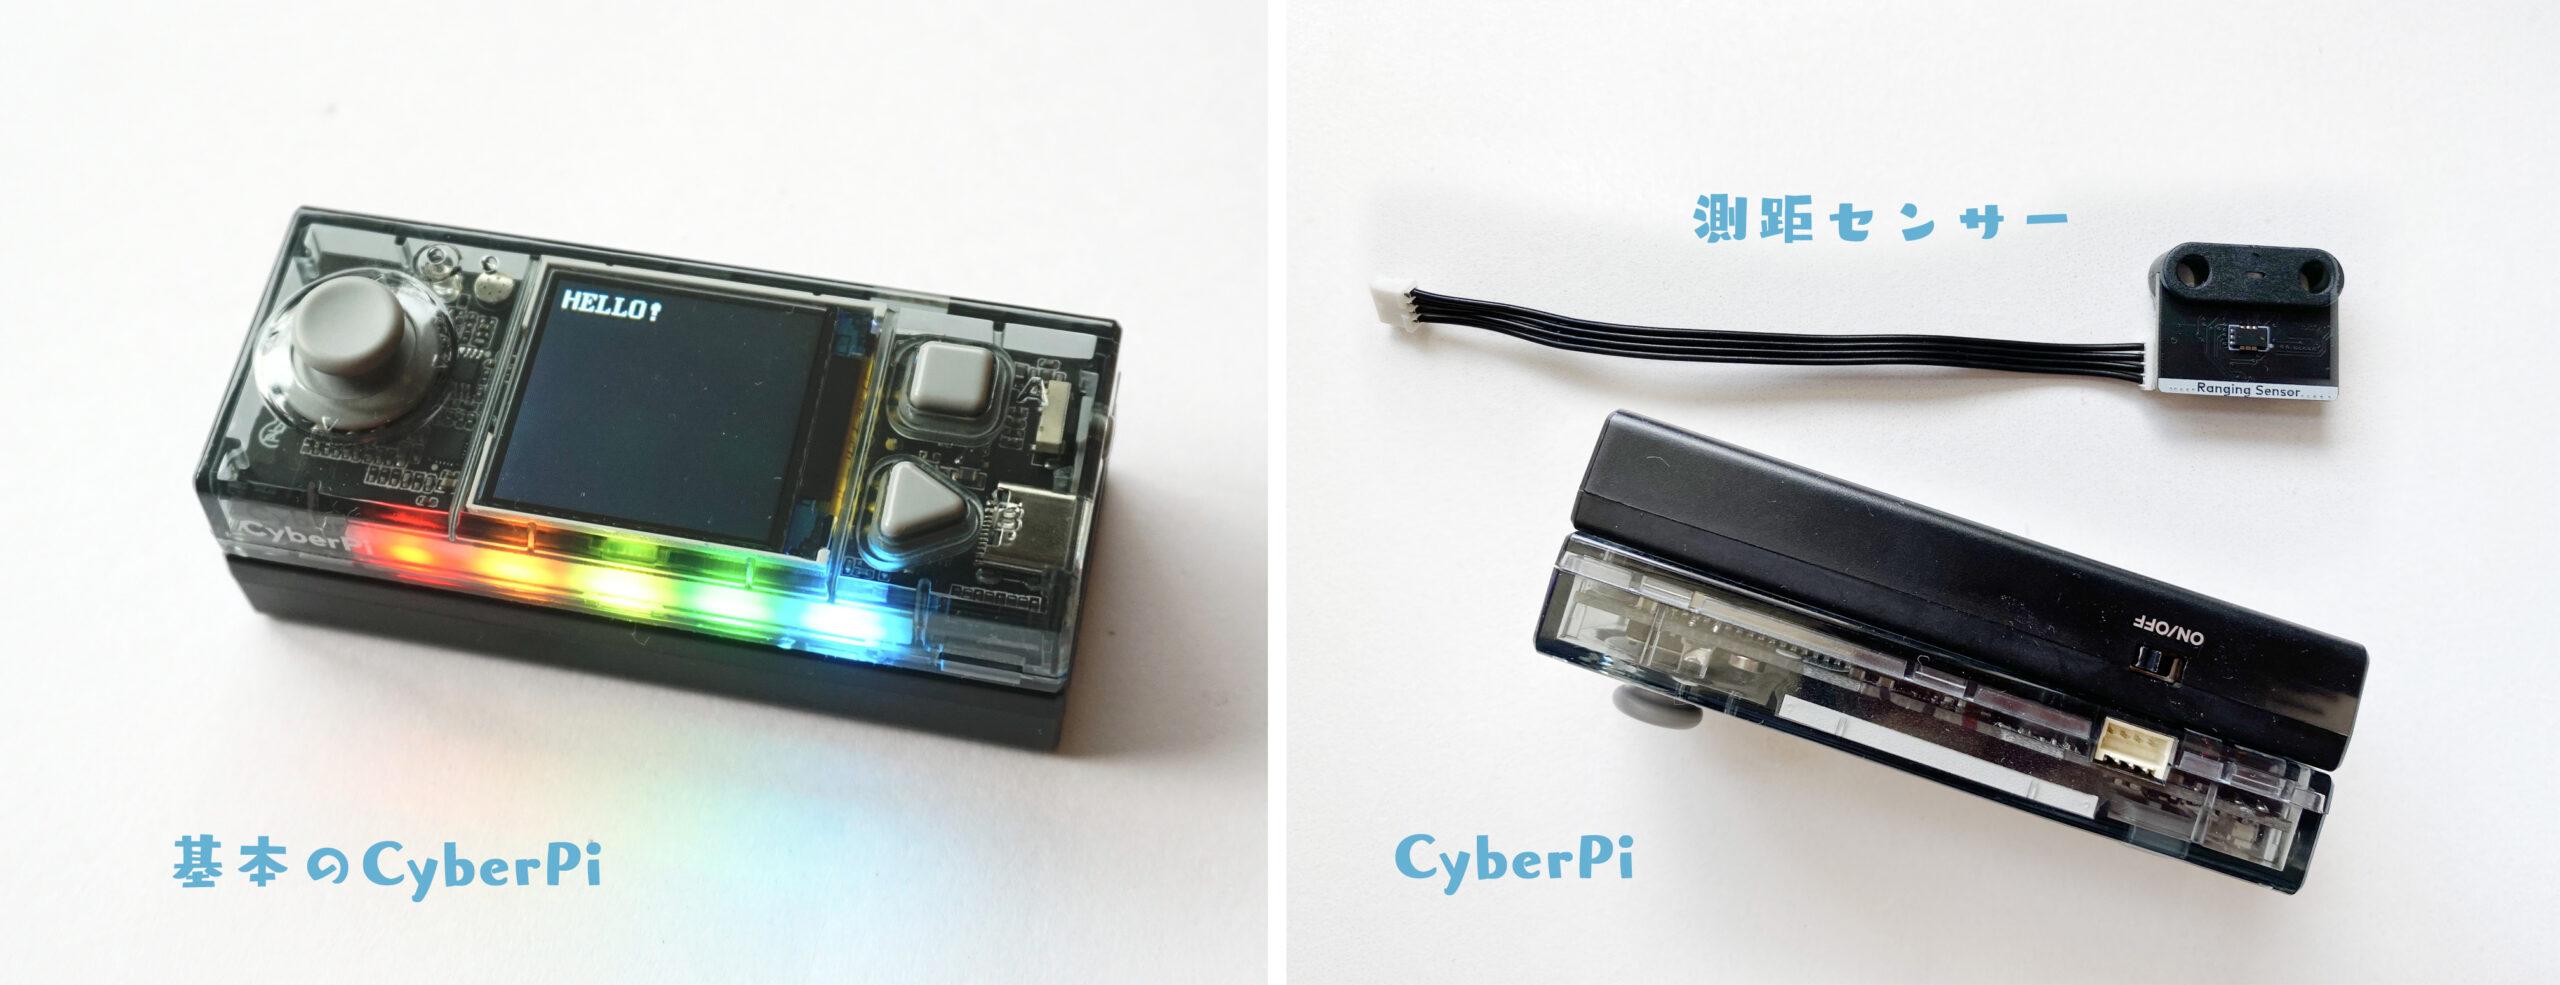 CyberPi